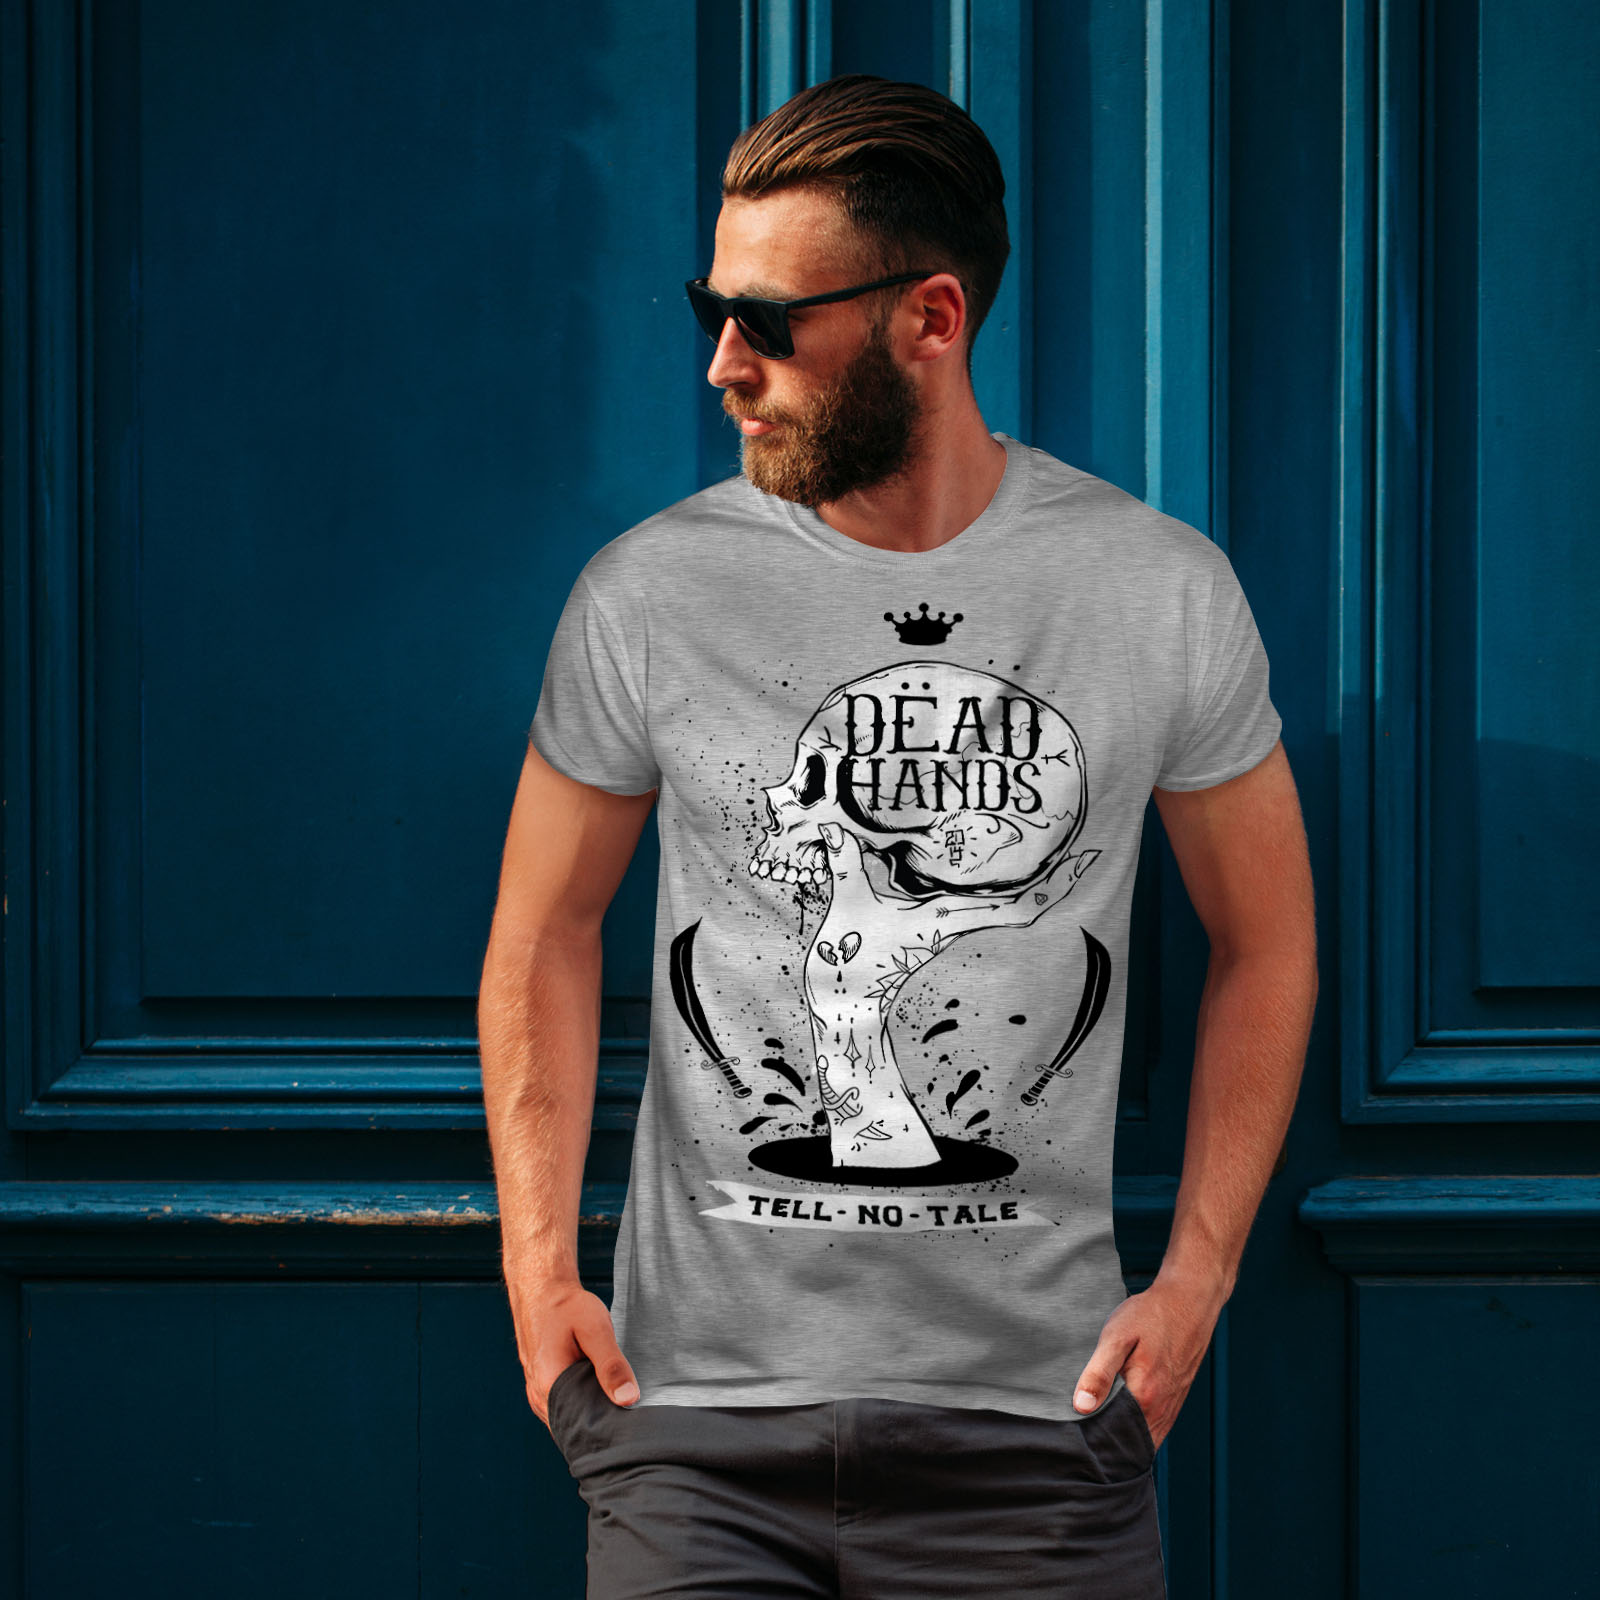 Skull Graphic Design Printed Tee Wellcoda Dead Hand Goth Mens T-shirt